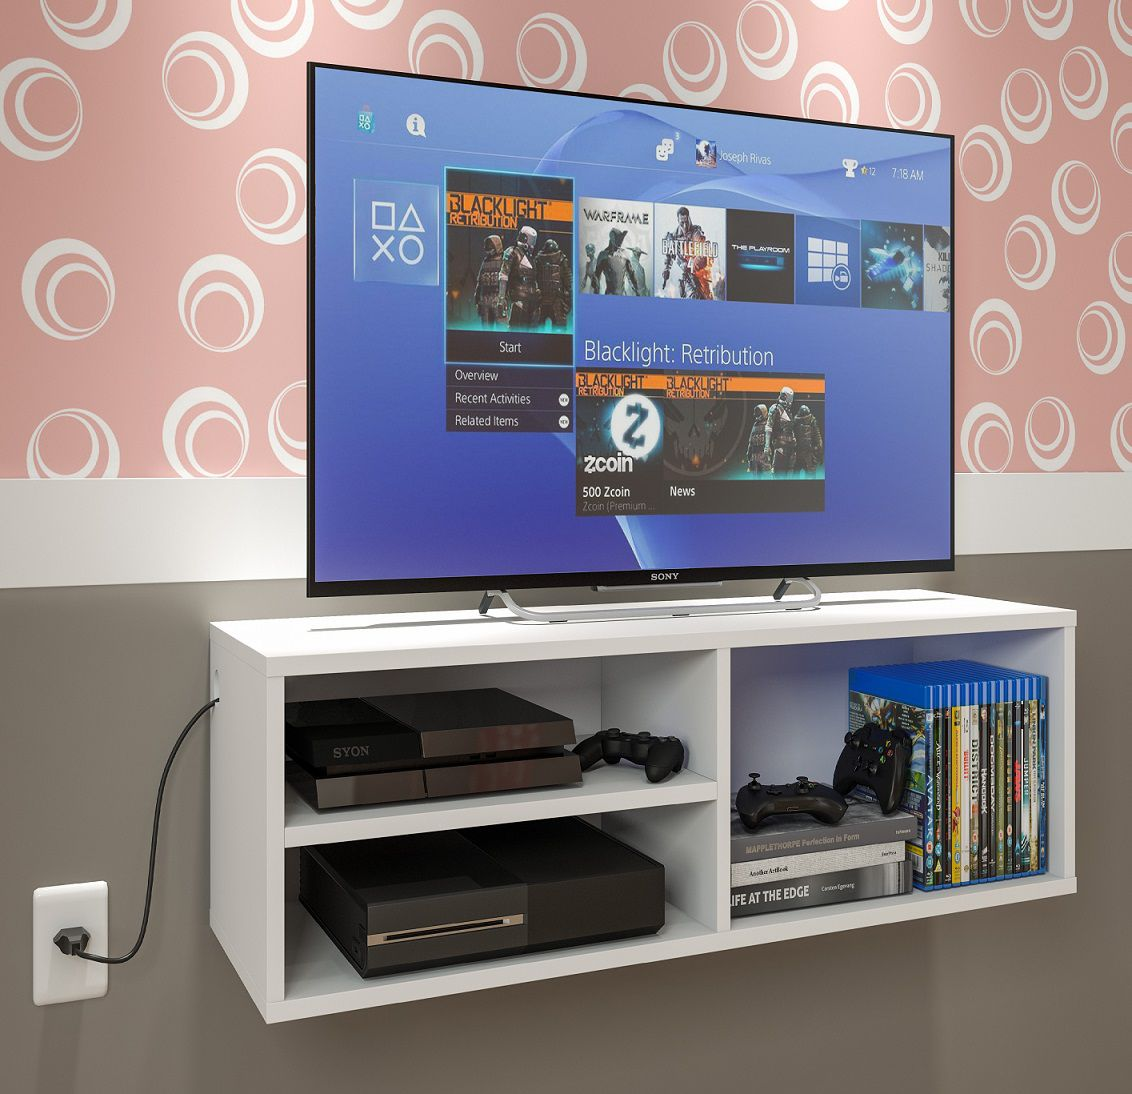 Rack P/ Tv, Dvd, Cd ,video Game, Nicho Prateleira Branco